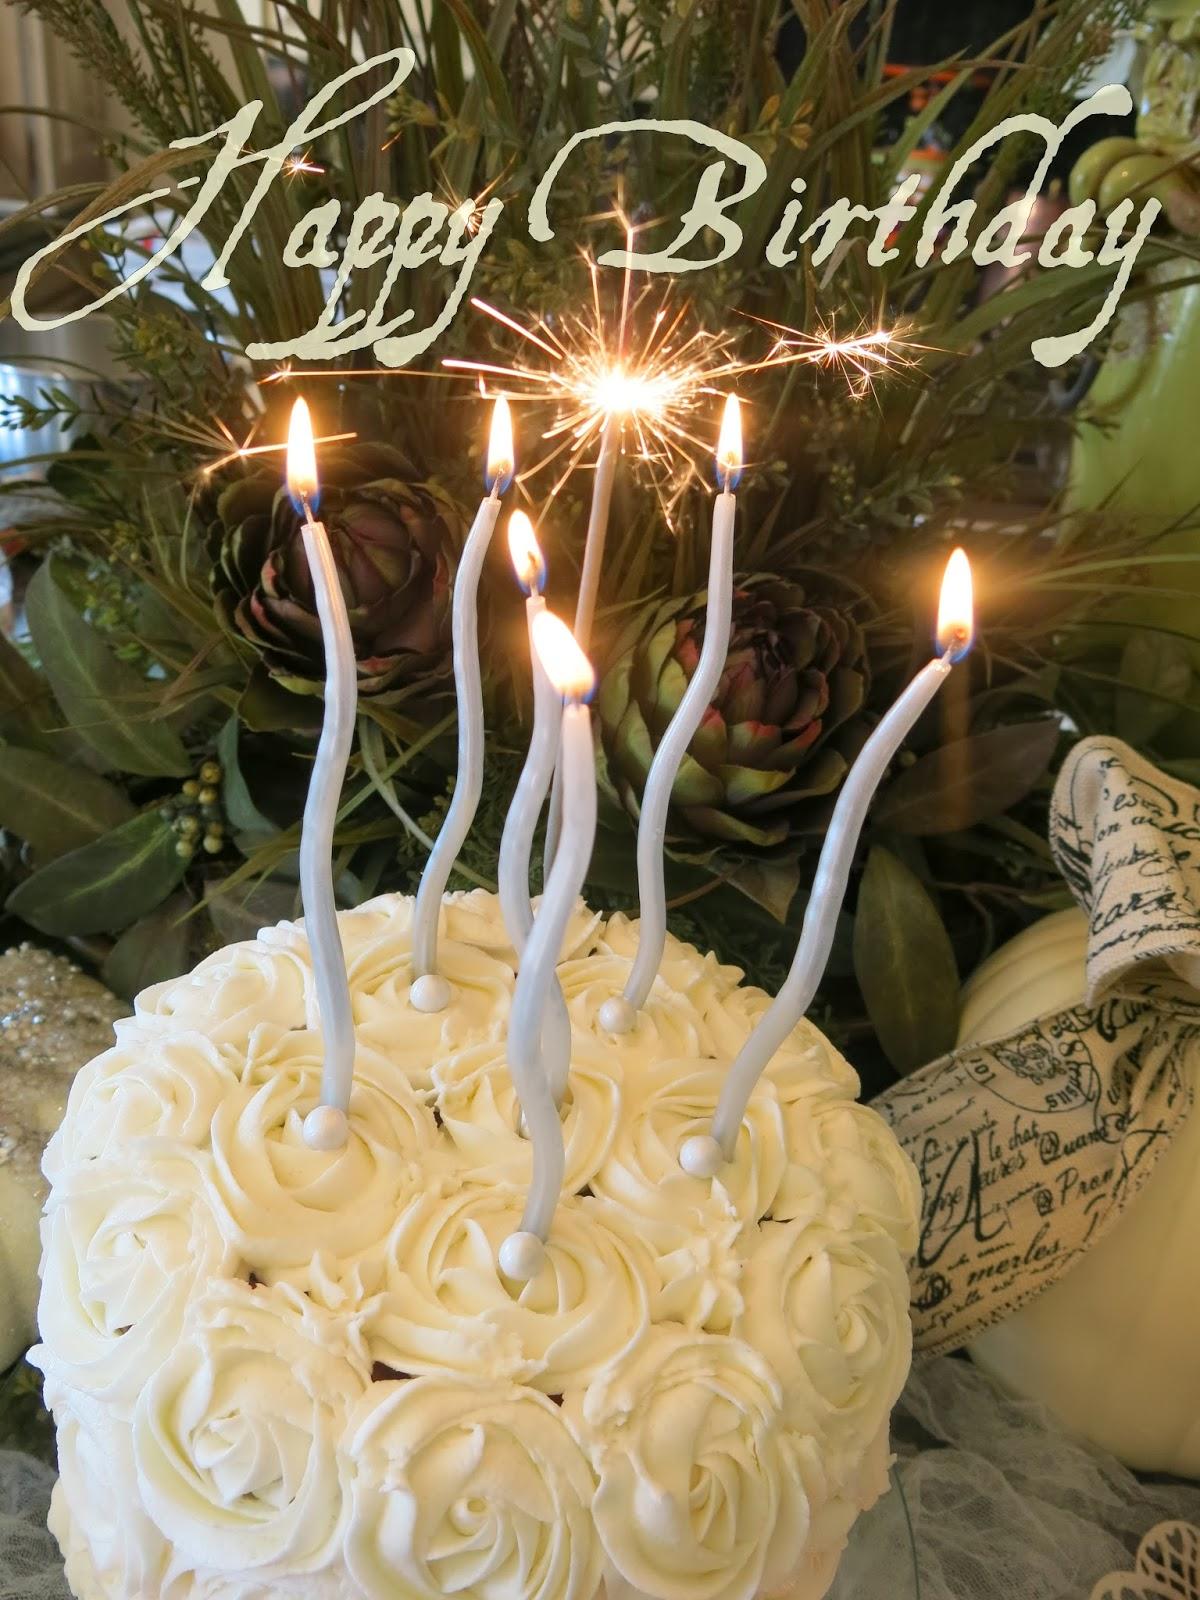 Astounding Purple Chocolat Home Surprise Its A Happy Happy Birthday To Funny Birthday Cards Online Inifodamsfinfo